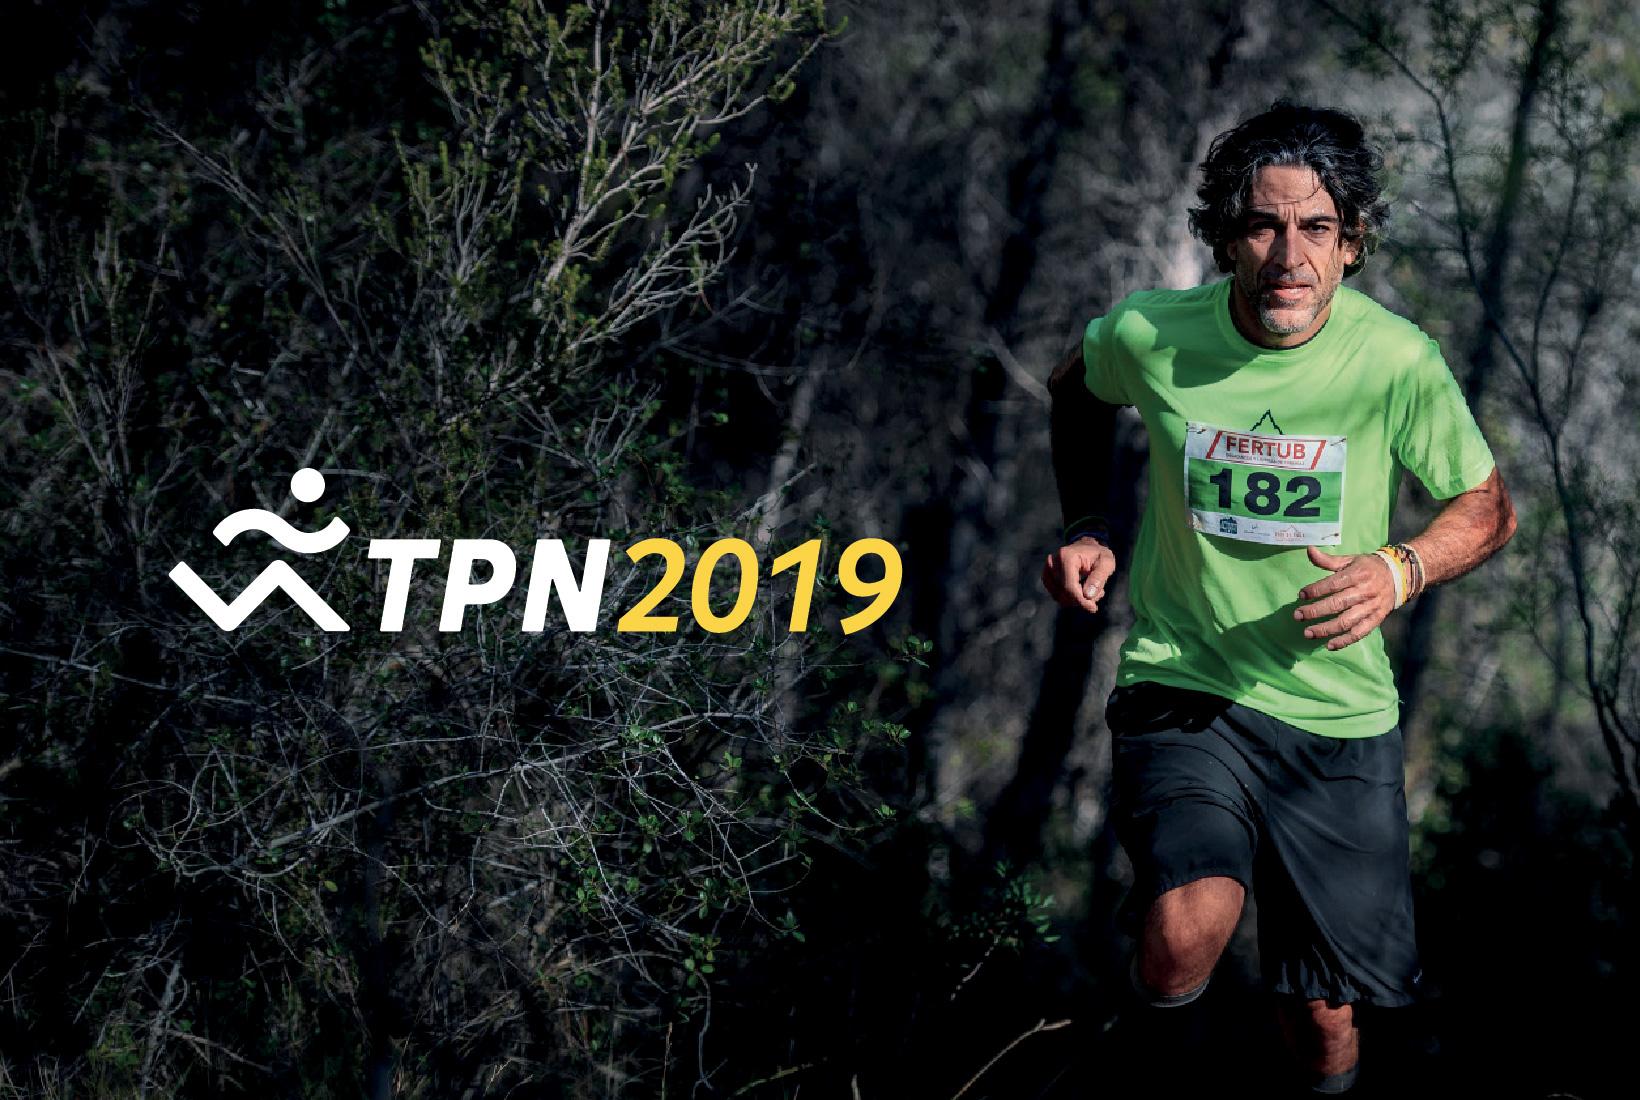 TPN-BFPTC-09